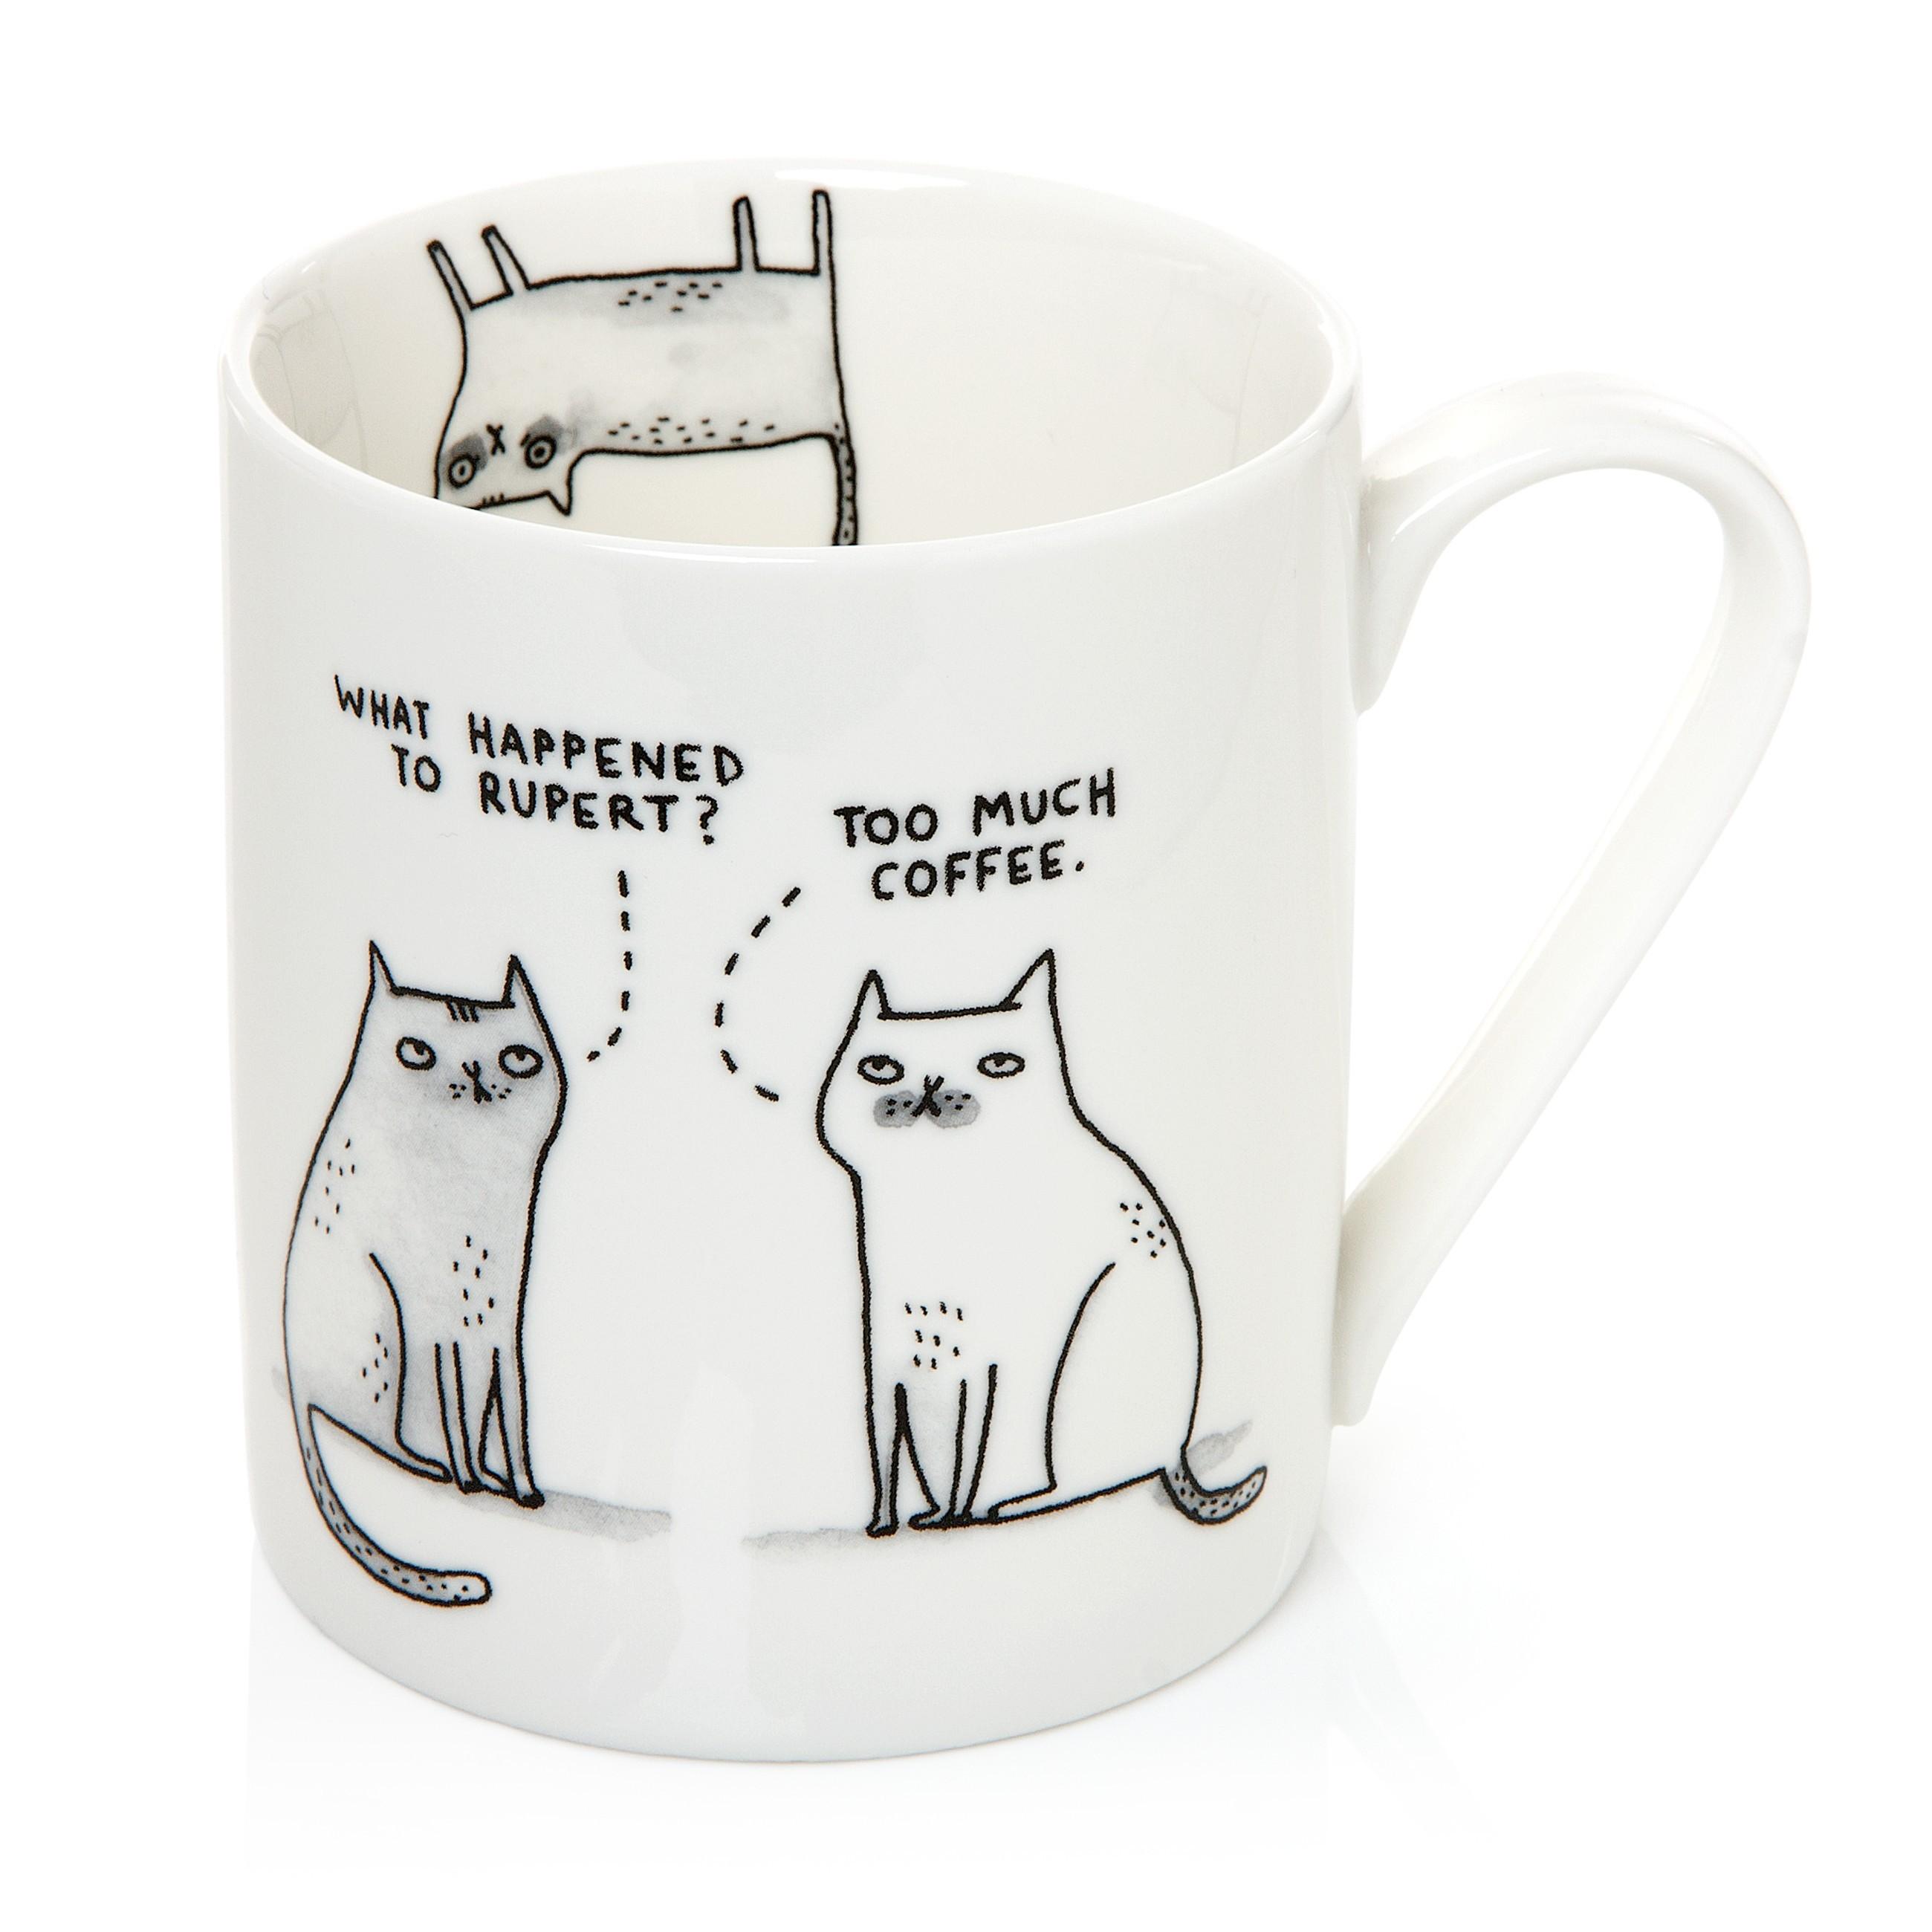 Mugs Cats Make Me Happy Mug Cat Lover Cat Gift Cat Mug Coffee Mug Cat Gifts Office Home Furniture Diy Tallergrafico Com Uy